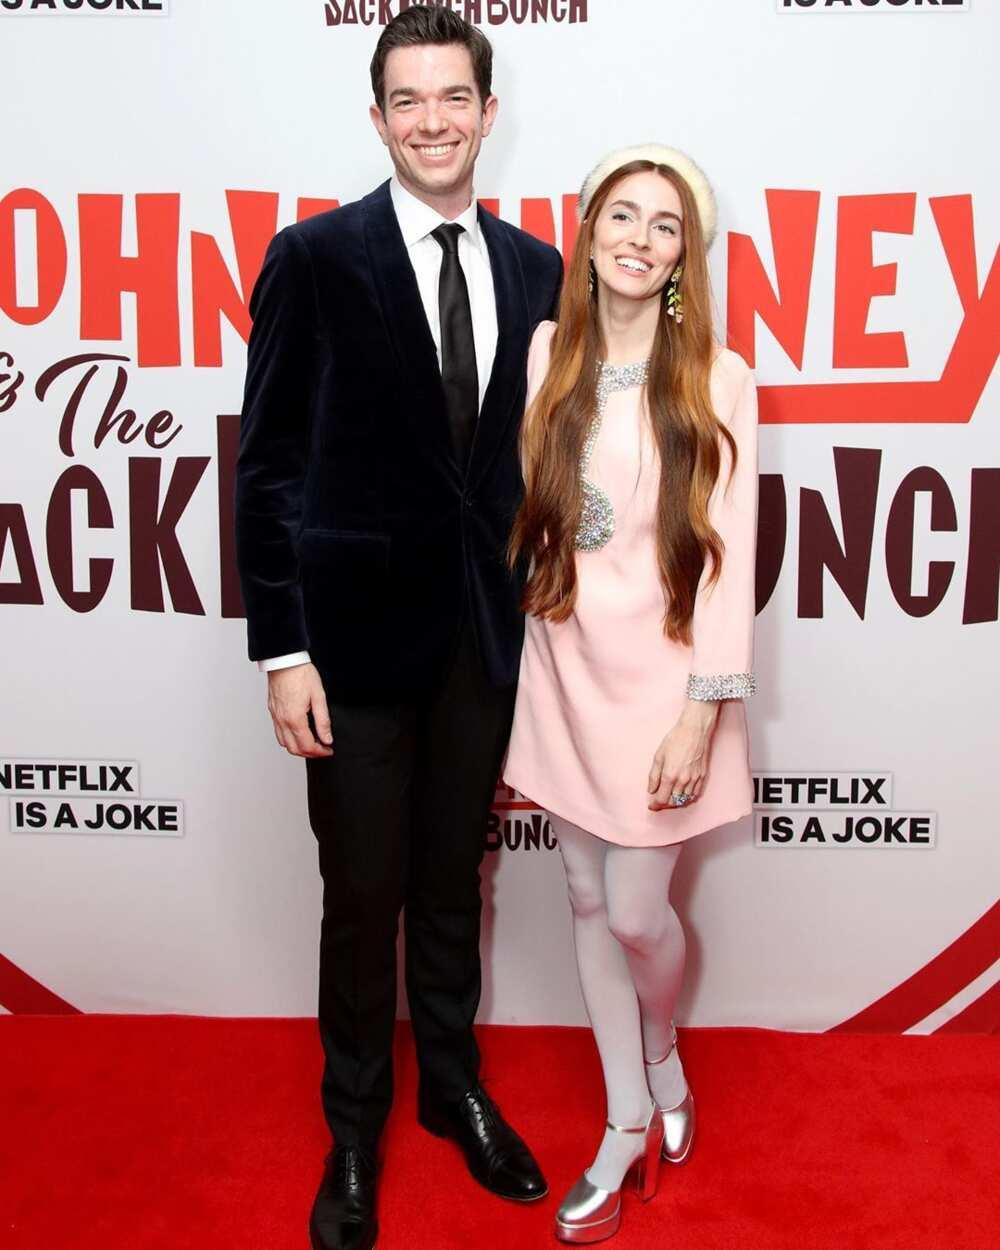 John Mulaney and Annamarie Tendler